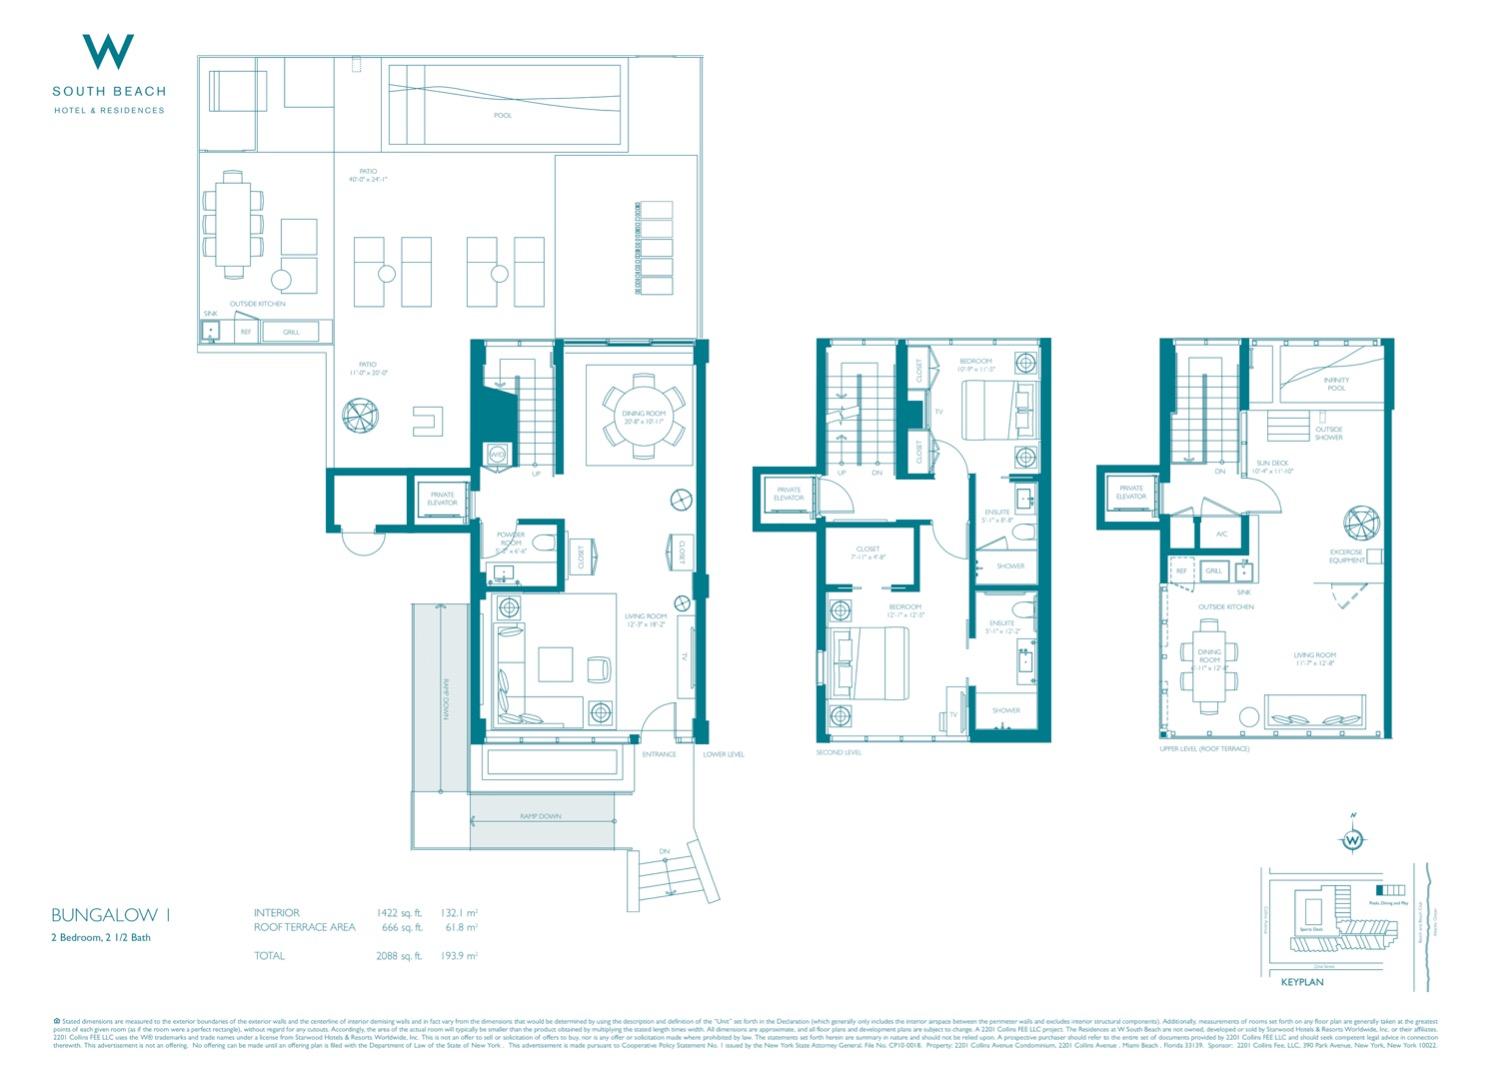 Floor plan image Bungalow 1 - 2/2/1  - 2088 sqft image